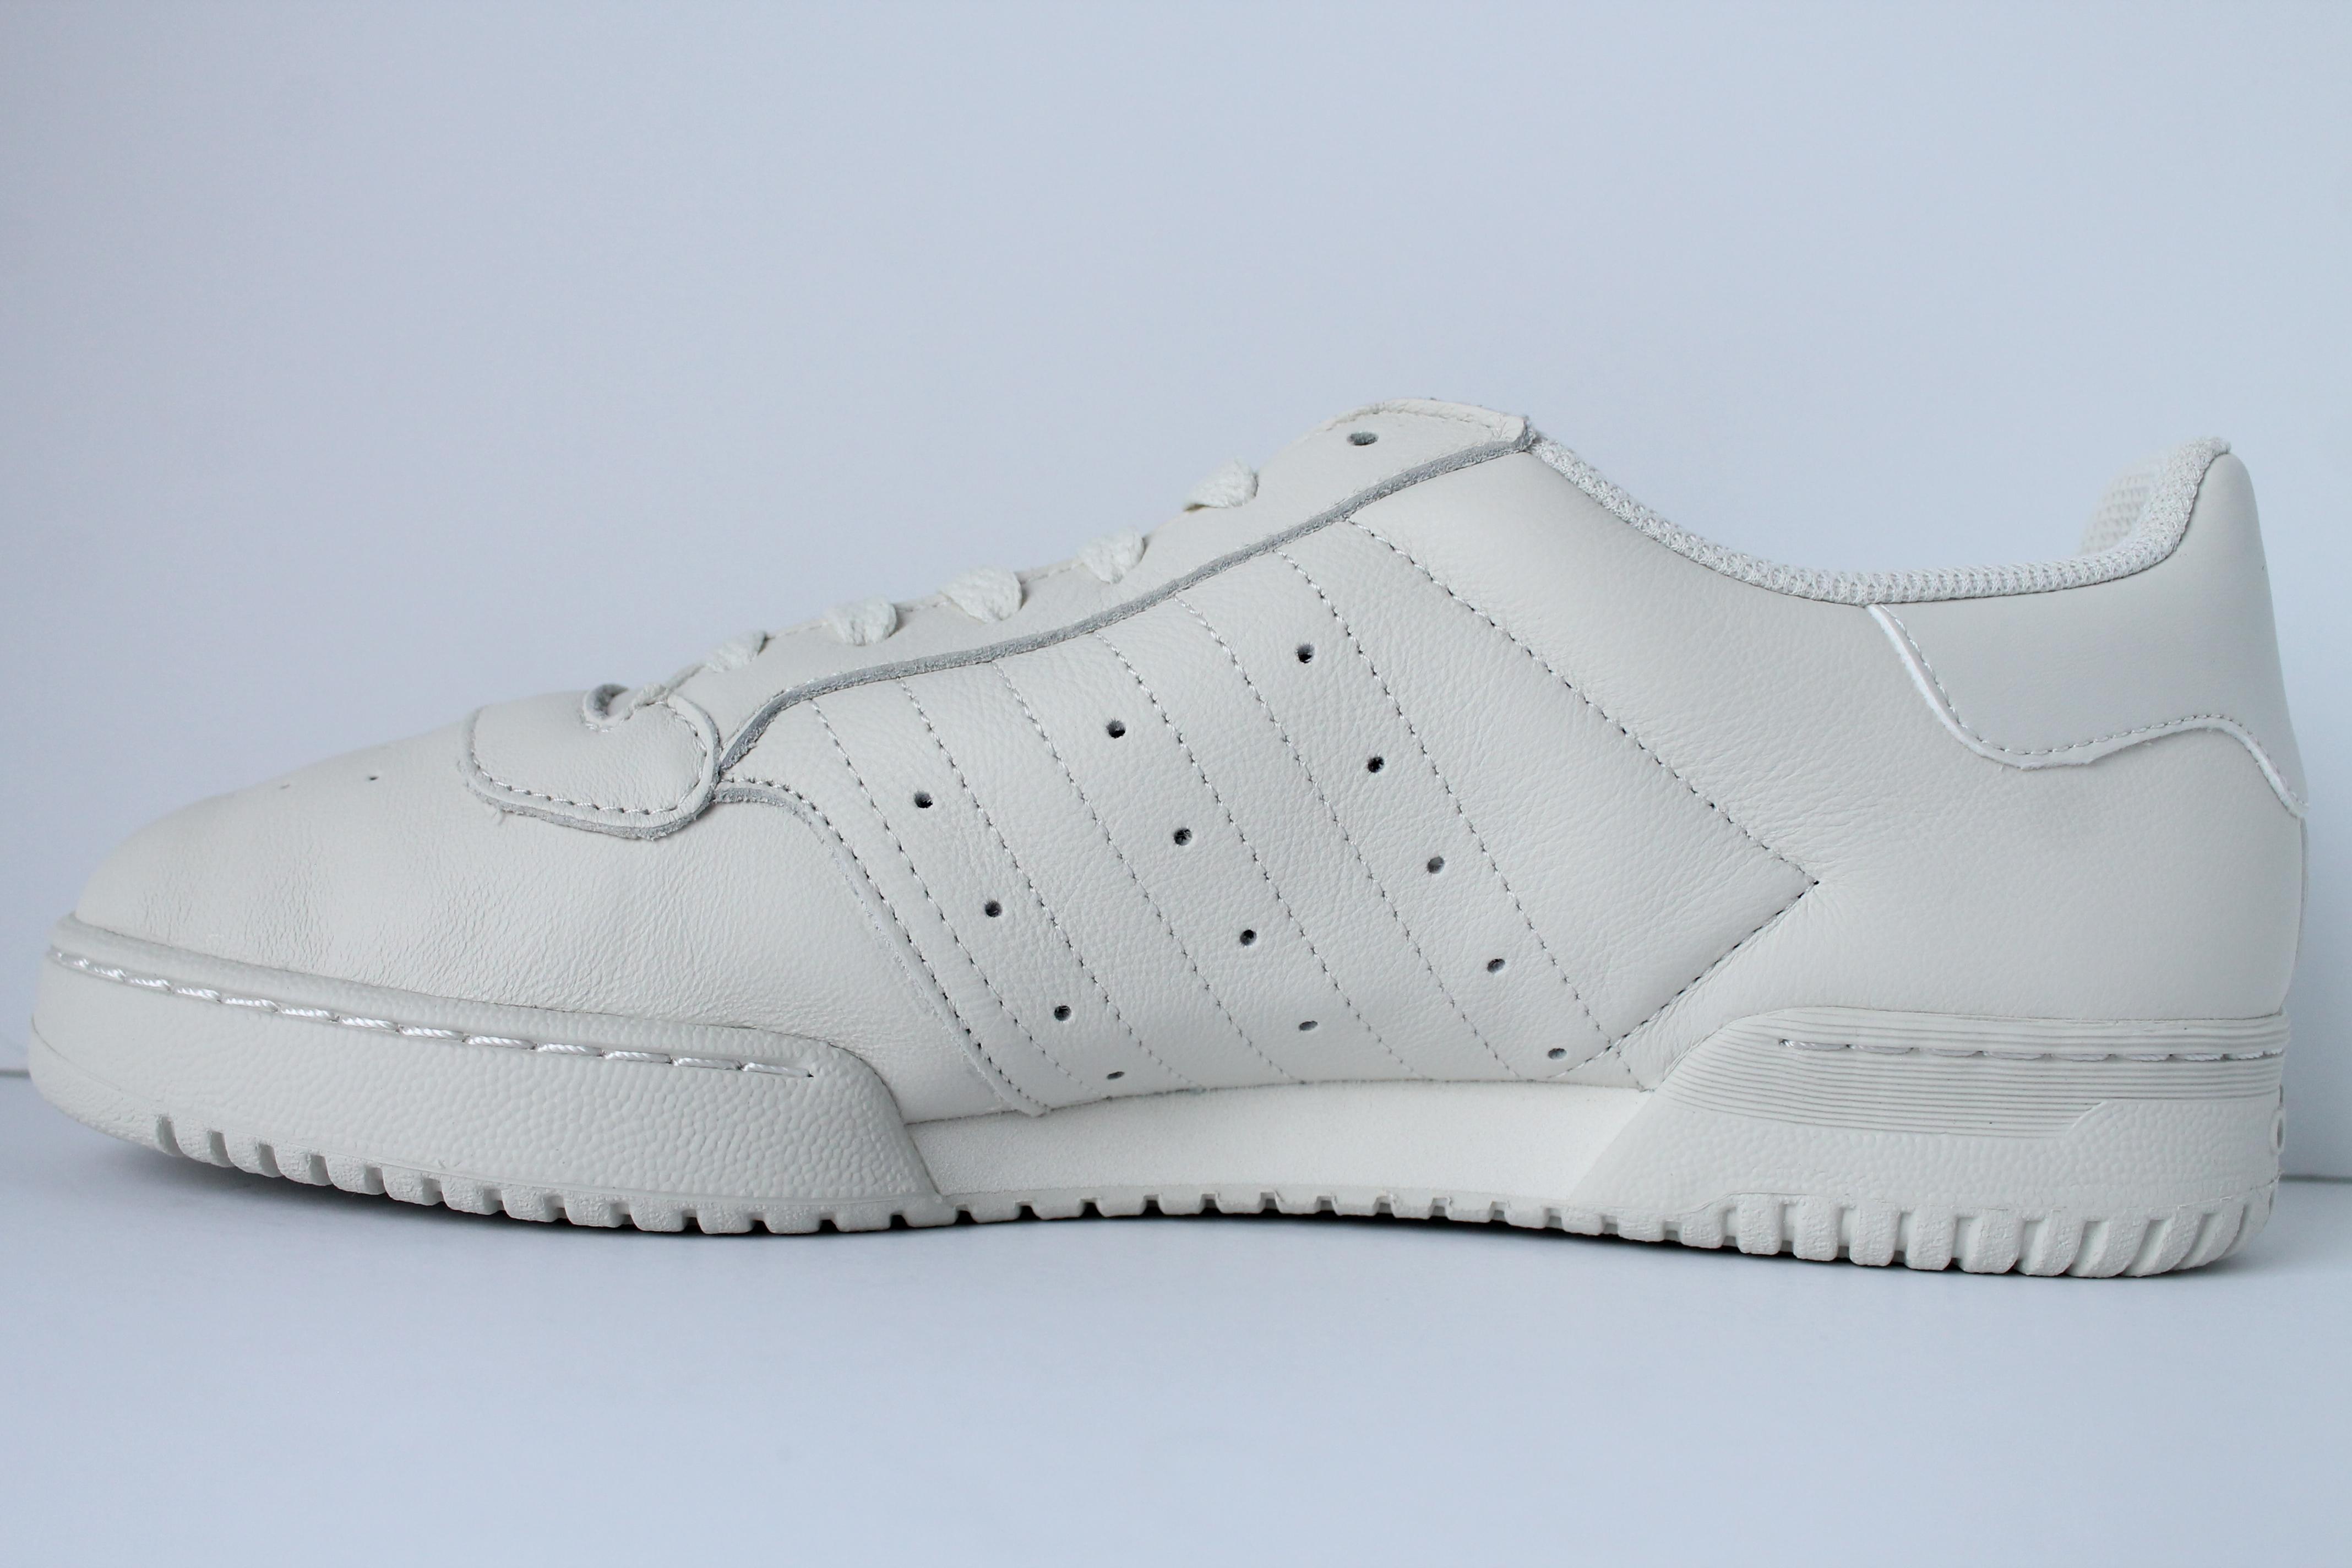 478640e112b93 ... Cream adidas Yeezy Powerphase ...